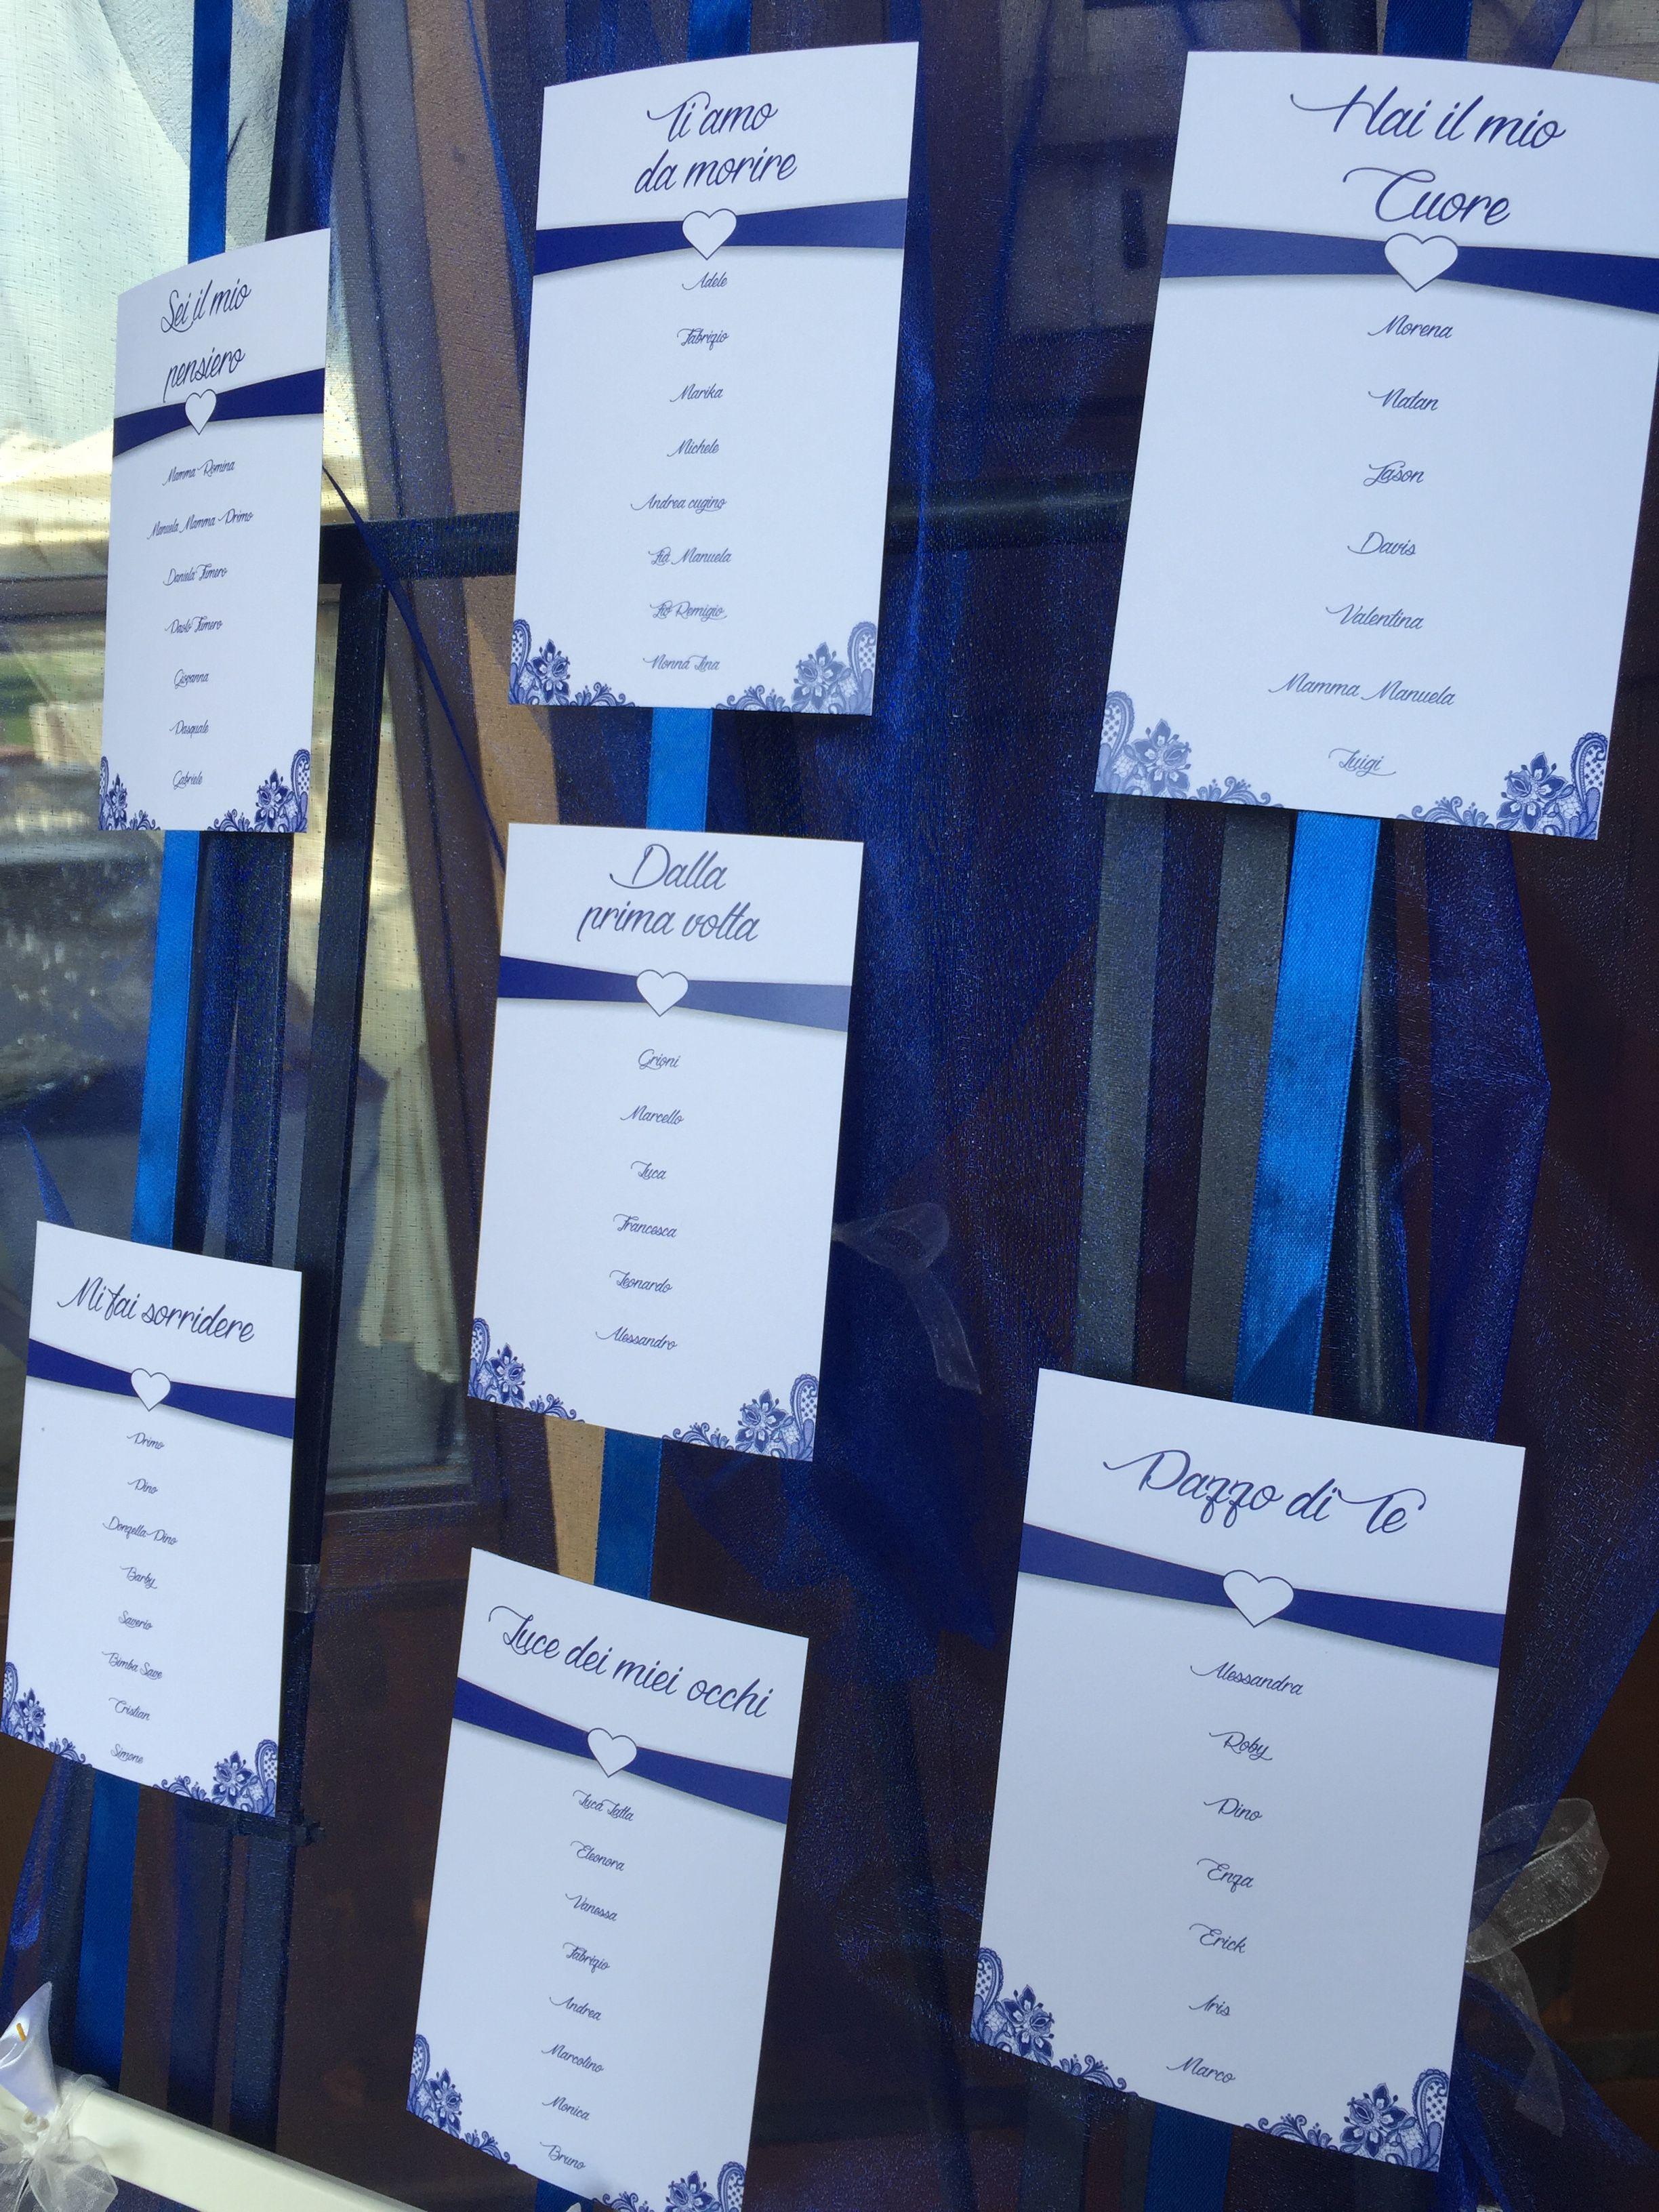 Tableau De Mariage Blu Amore Matrimonio Nozze Tableau Invitati Matrimonio Mariage Matrimonio Blu